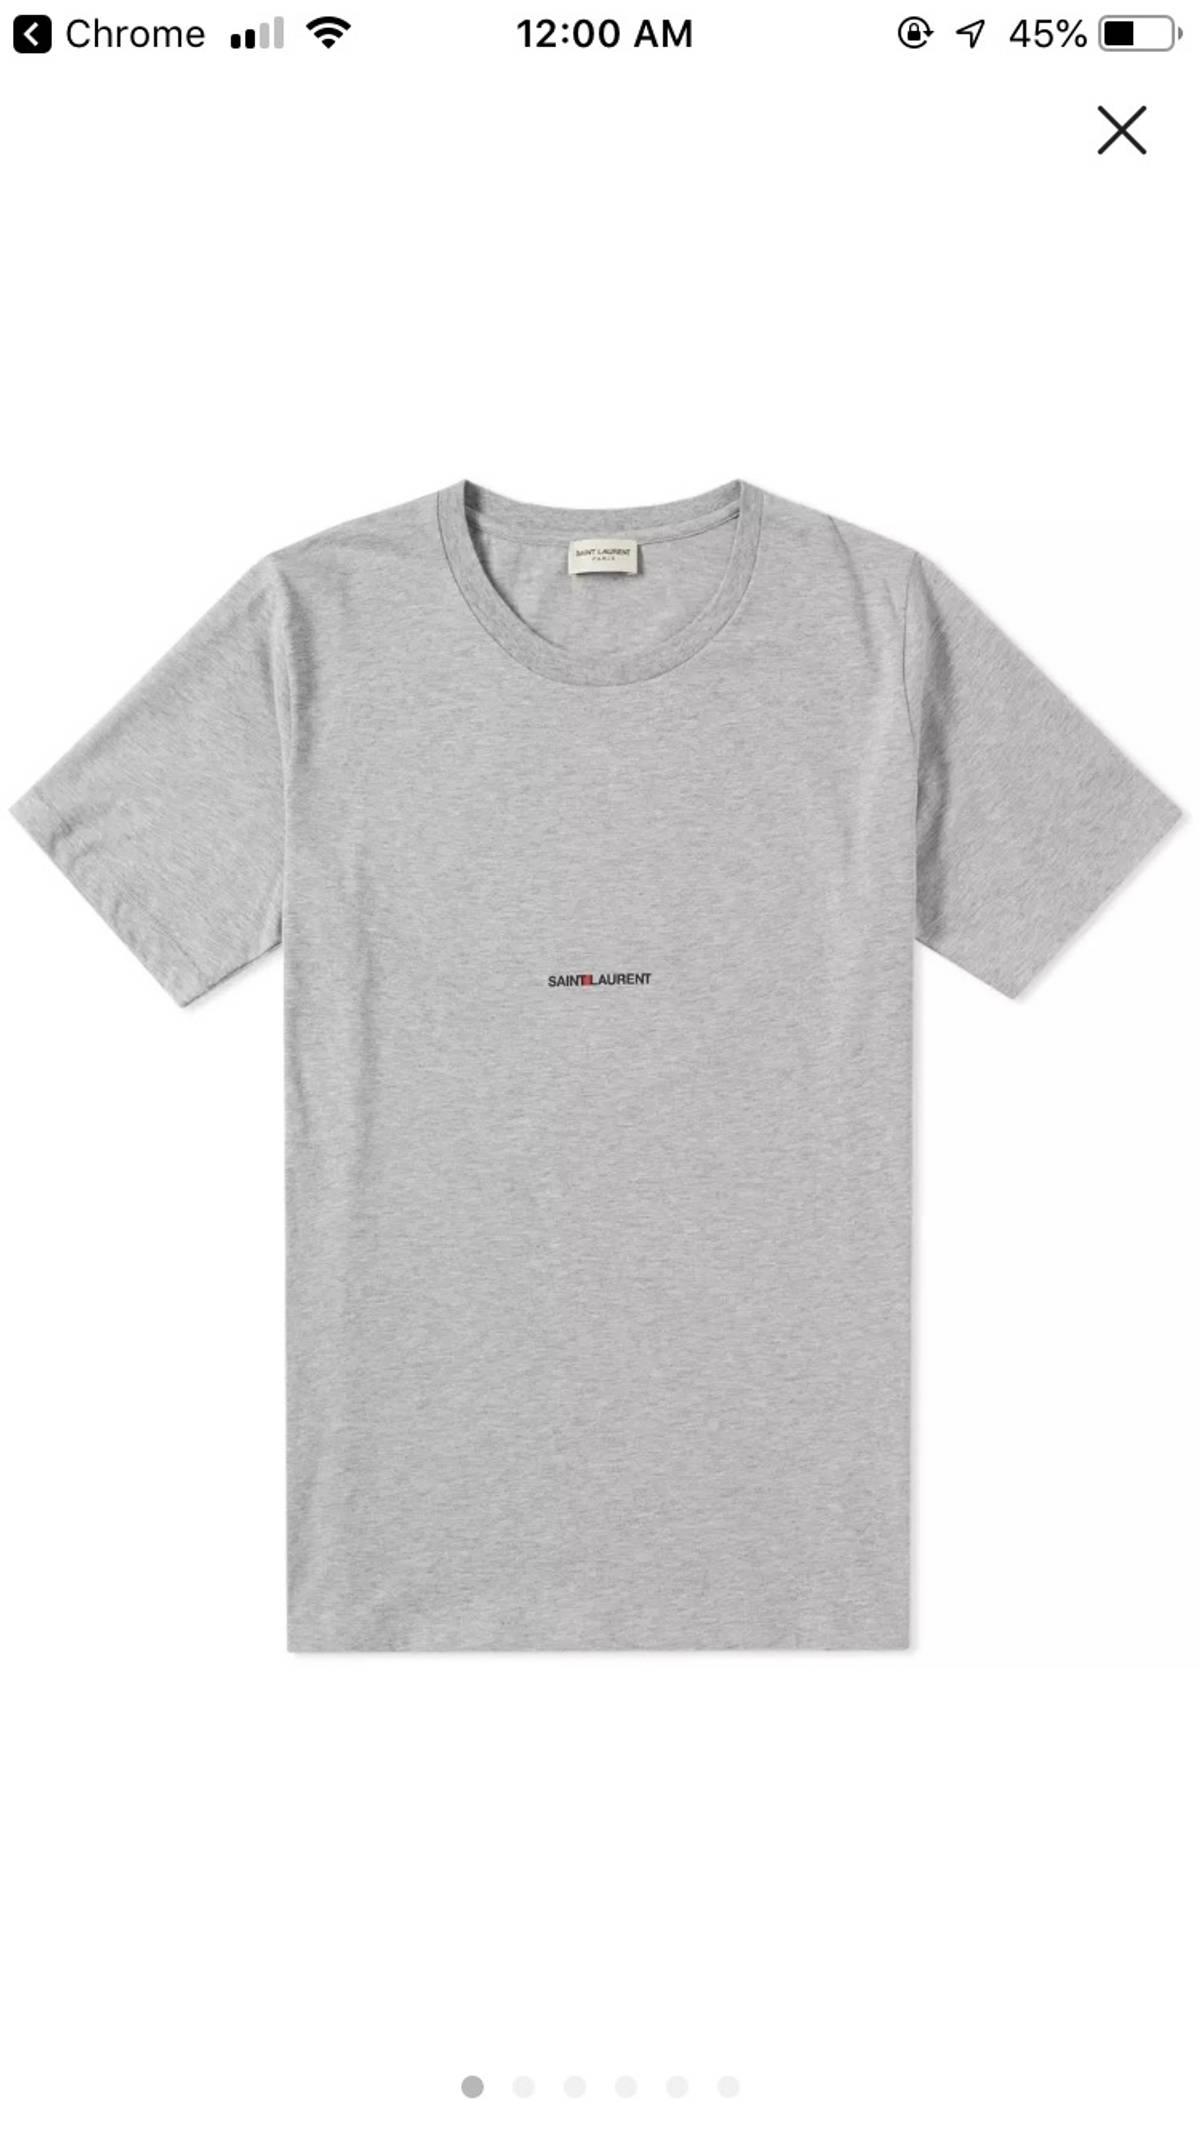 3a2b94dca83 Yves Saint Laurent Nwt Archive Logo T-shirt Grey Ysl Tee | Grailed